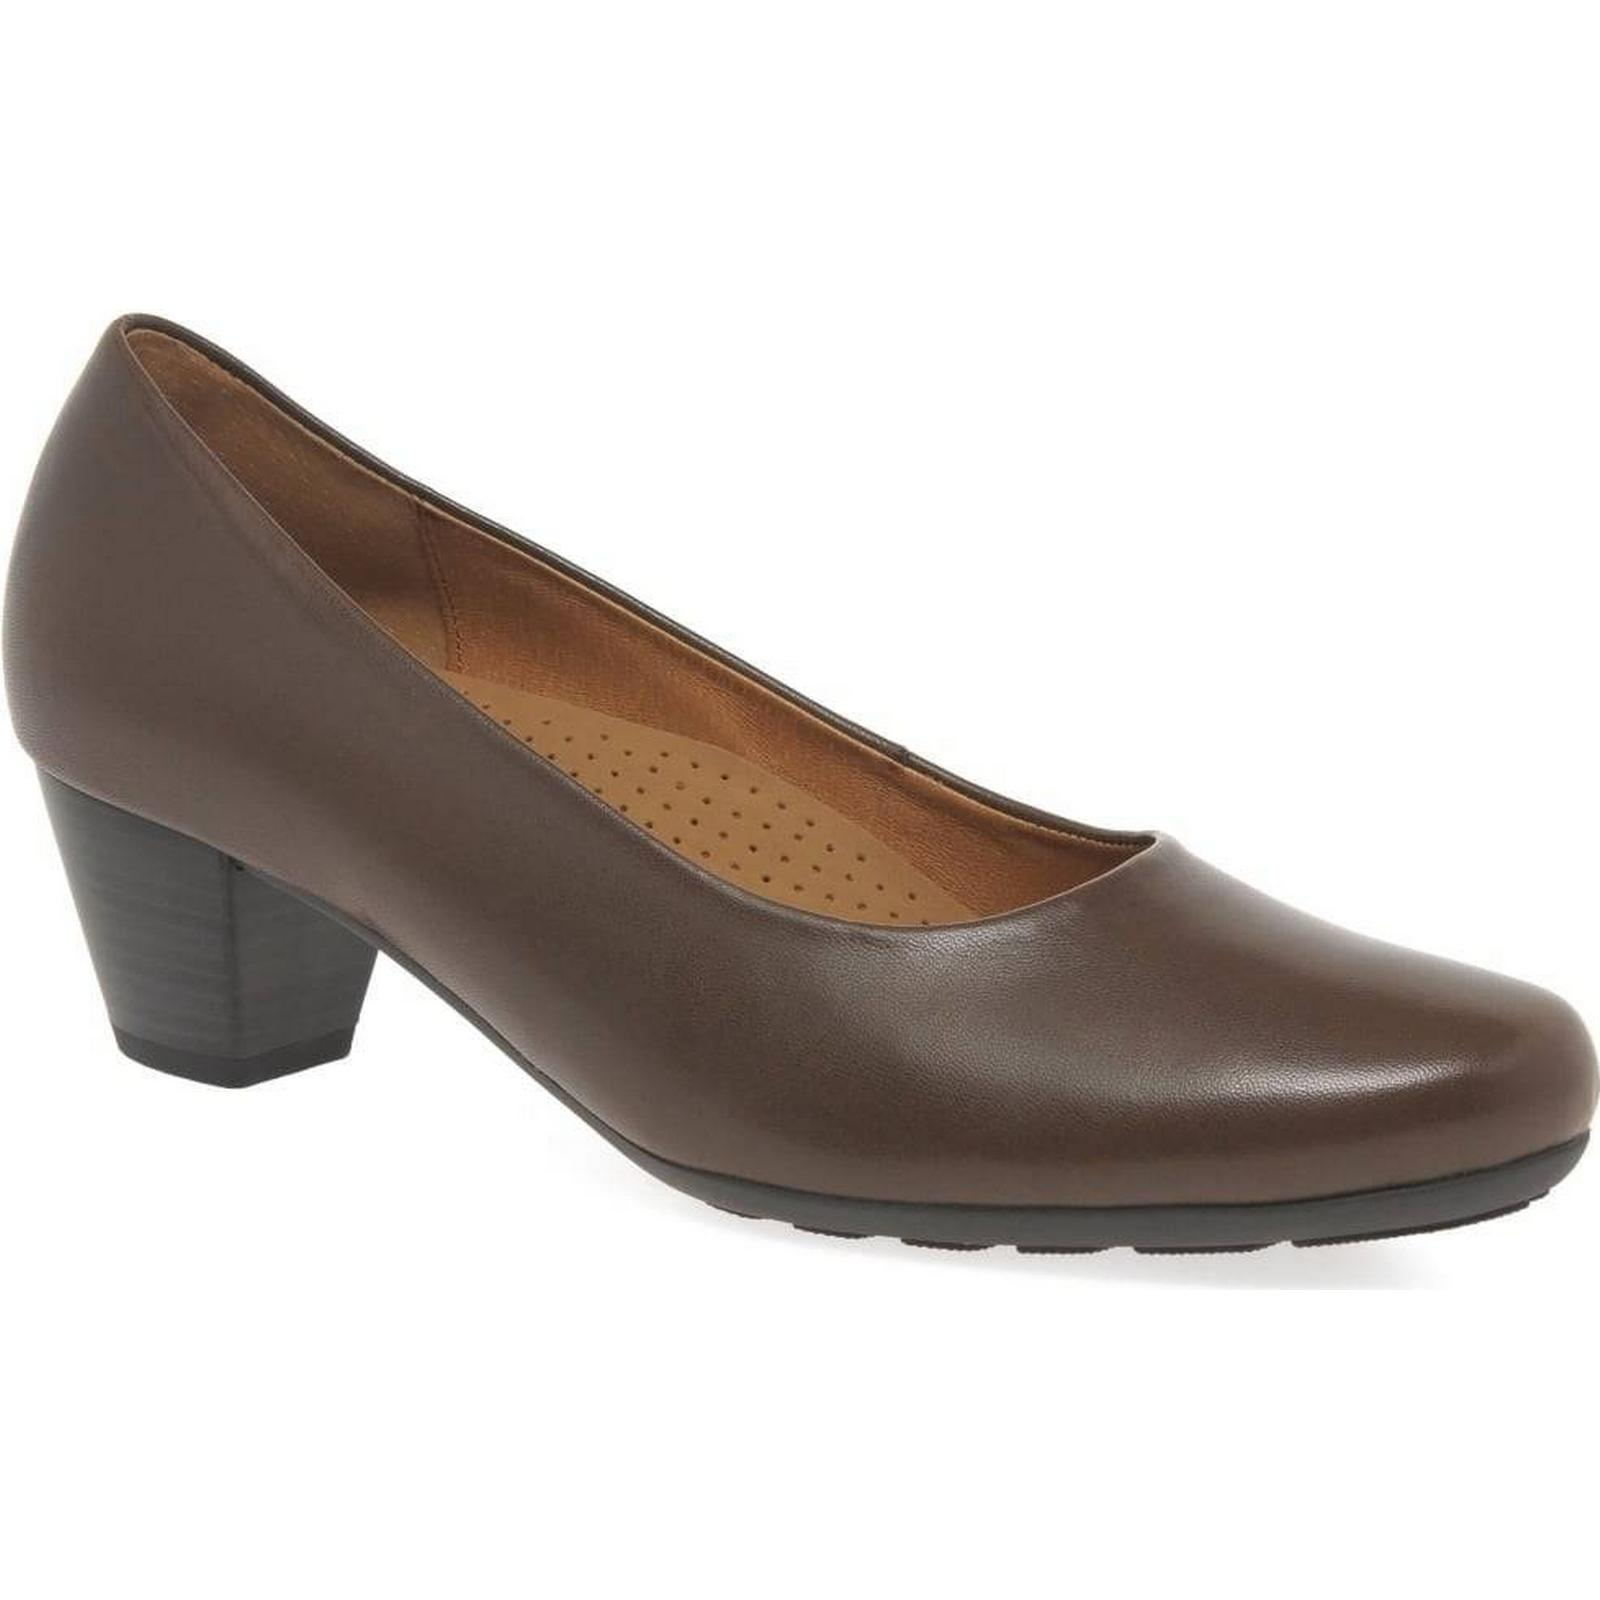 Gabor Brambling Colour: Womens Court Shoes Colour: Brambling Coffee, Size: 6.5 f021ad